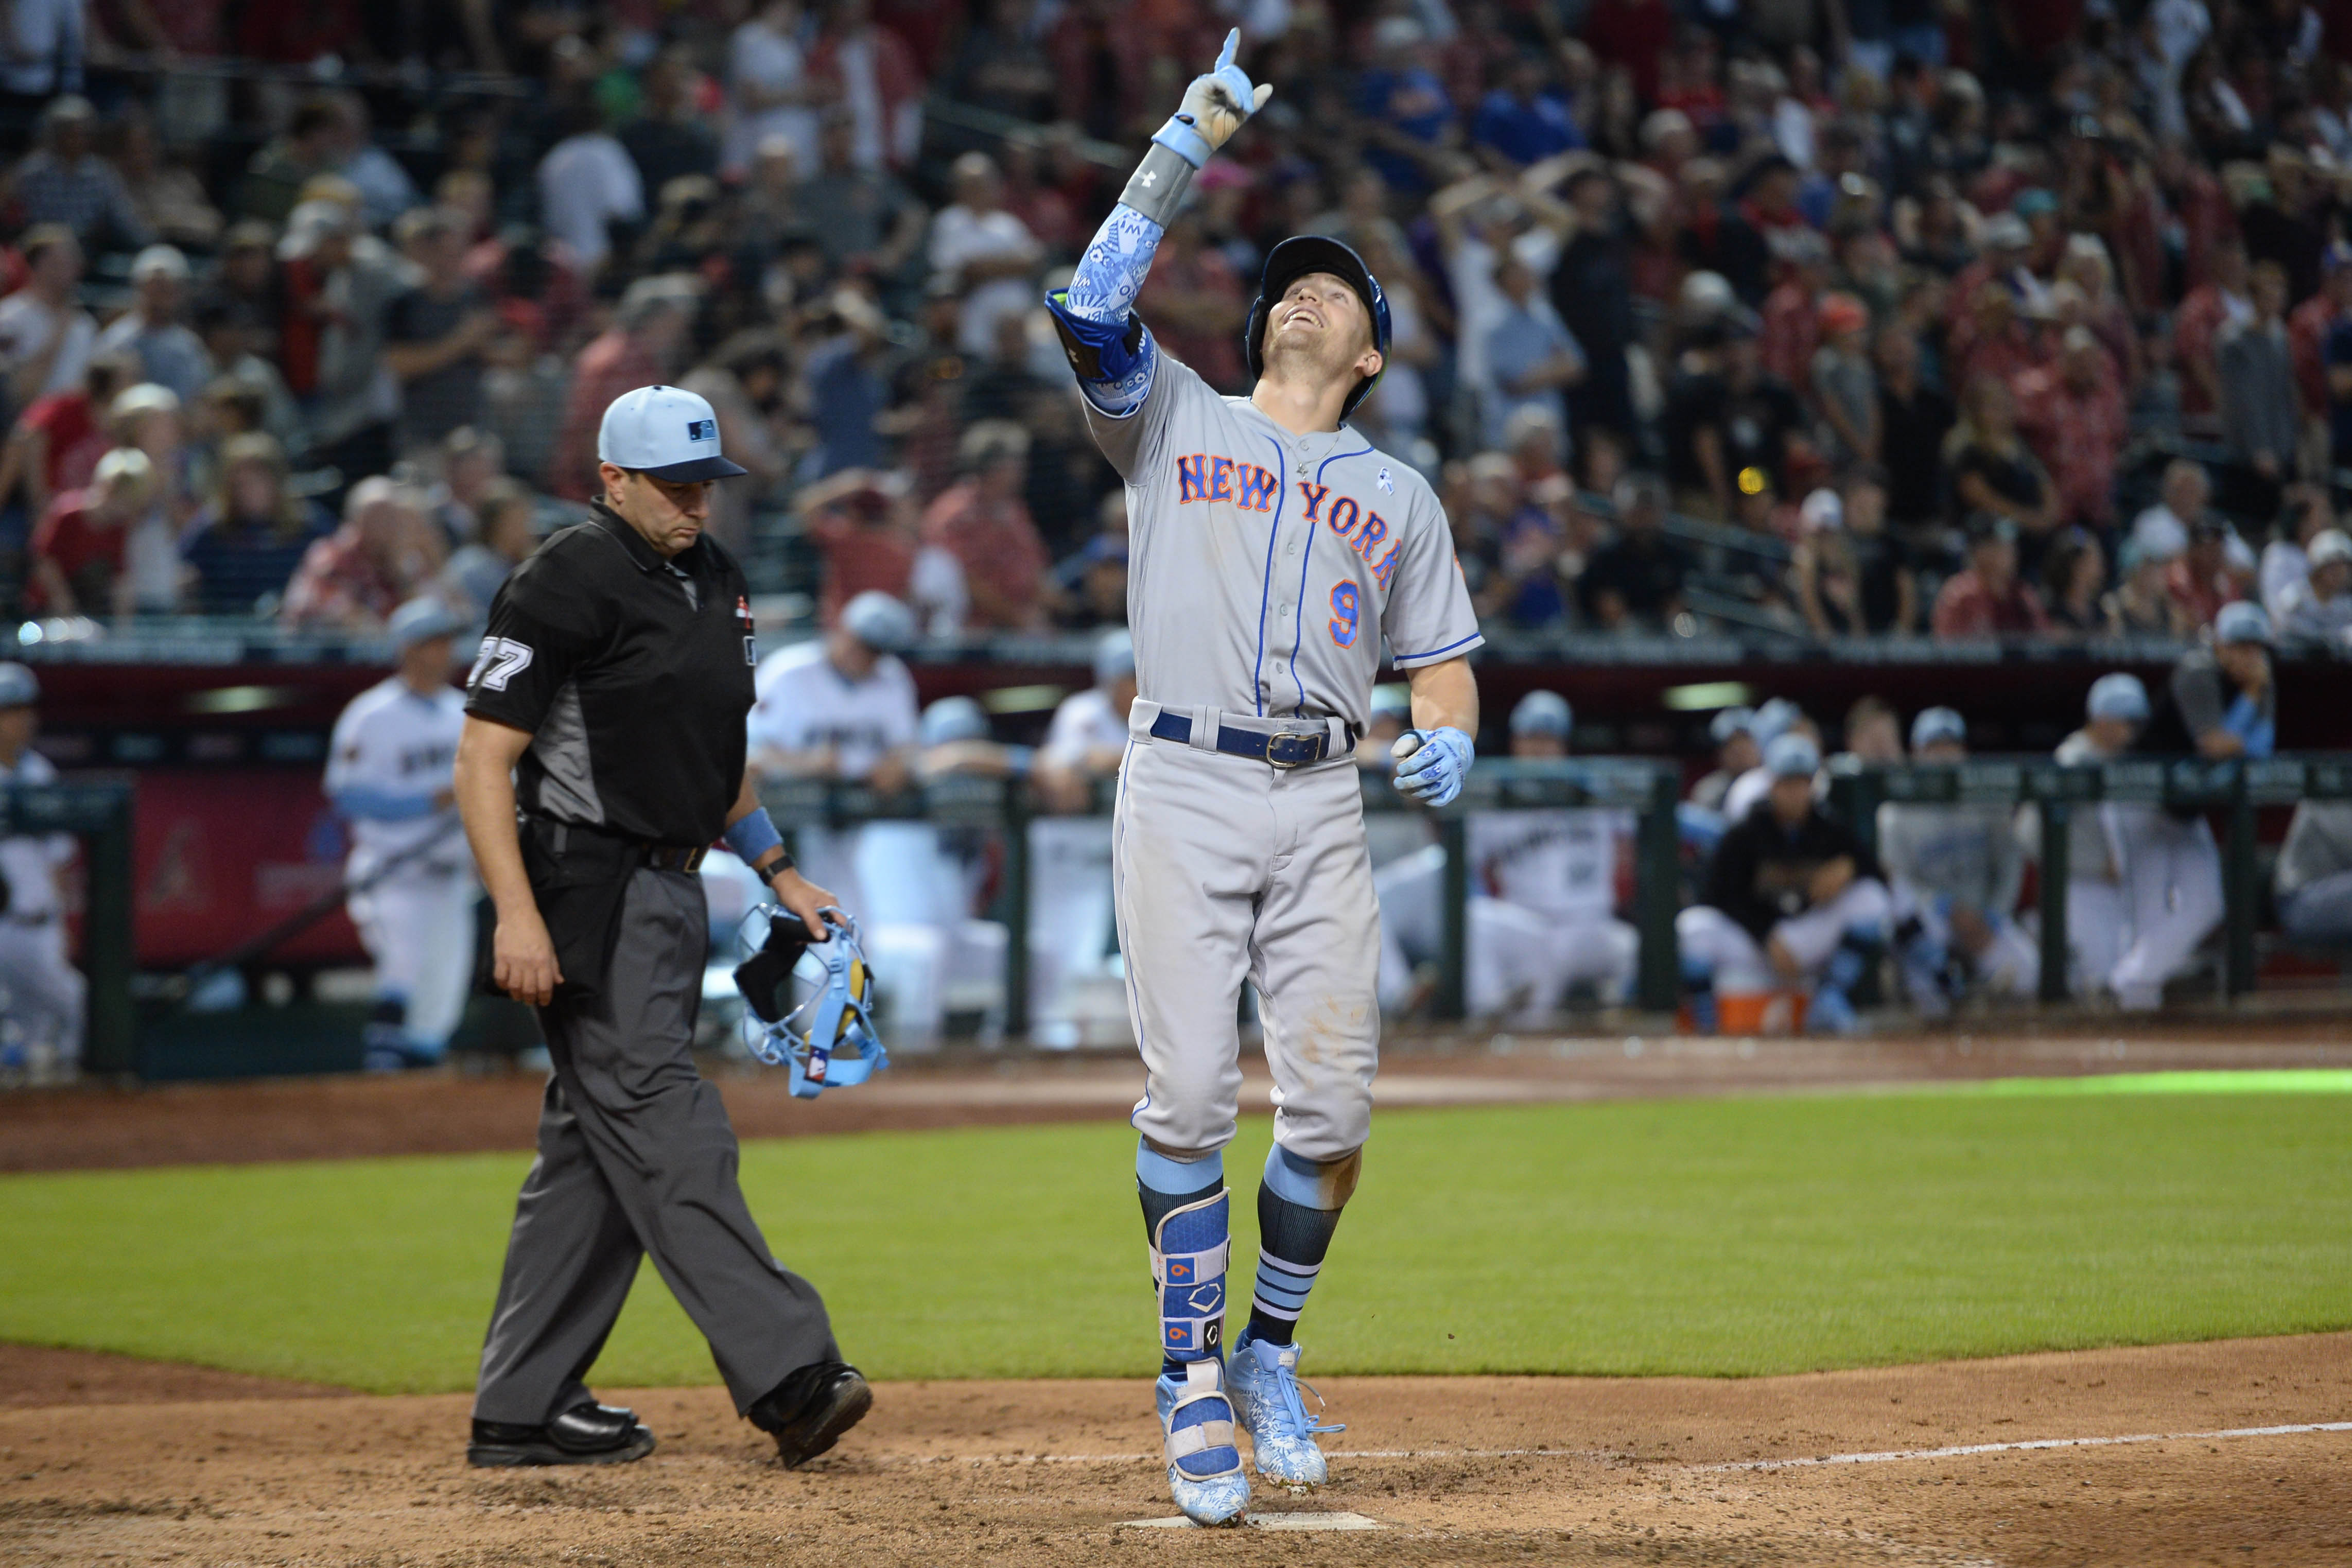 6/18/18 Game Preview: New York Mets at Colorado Rockies